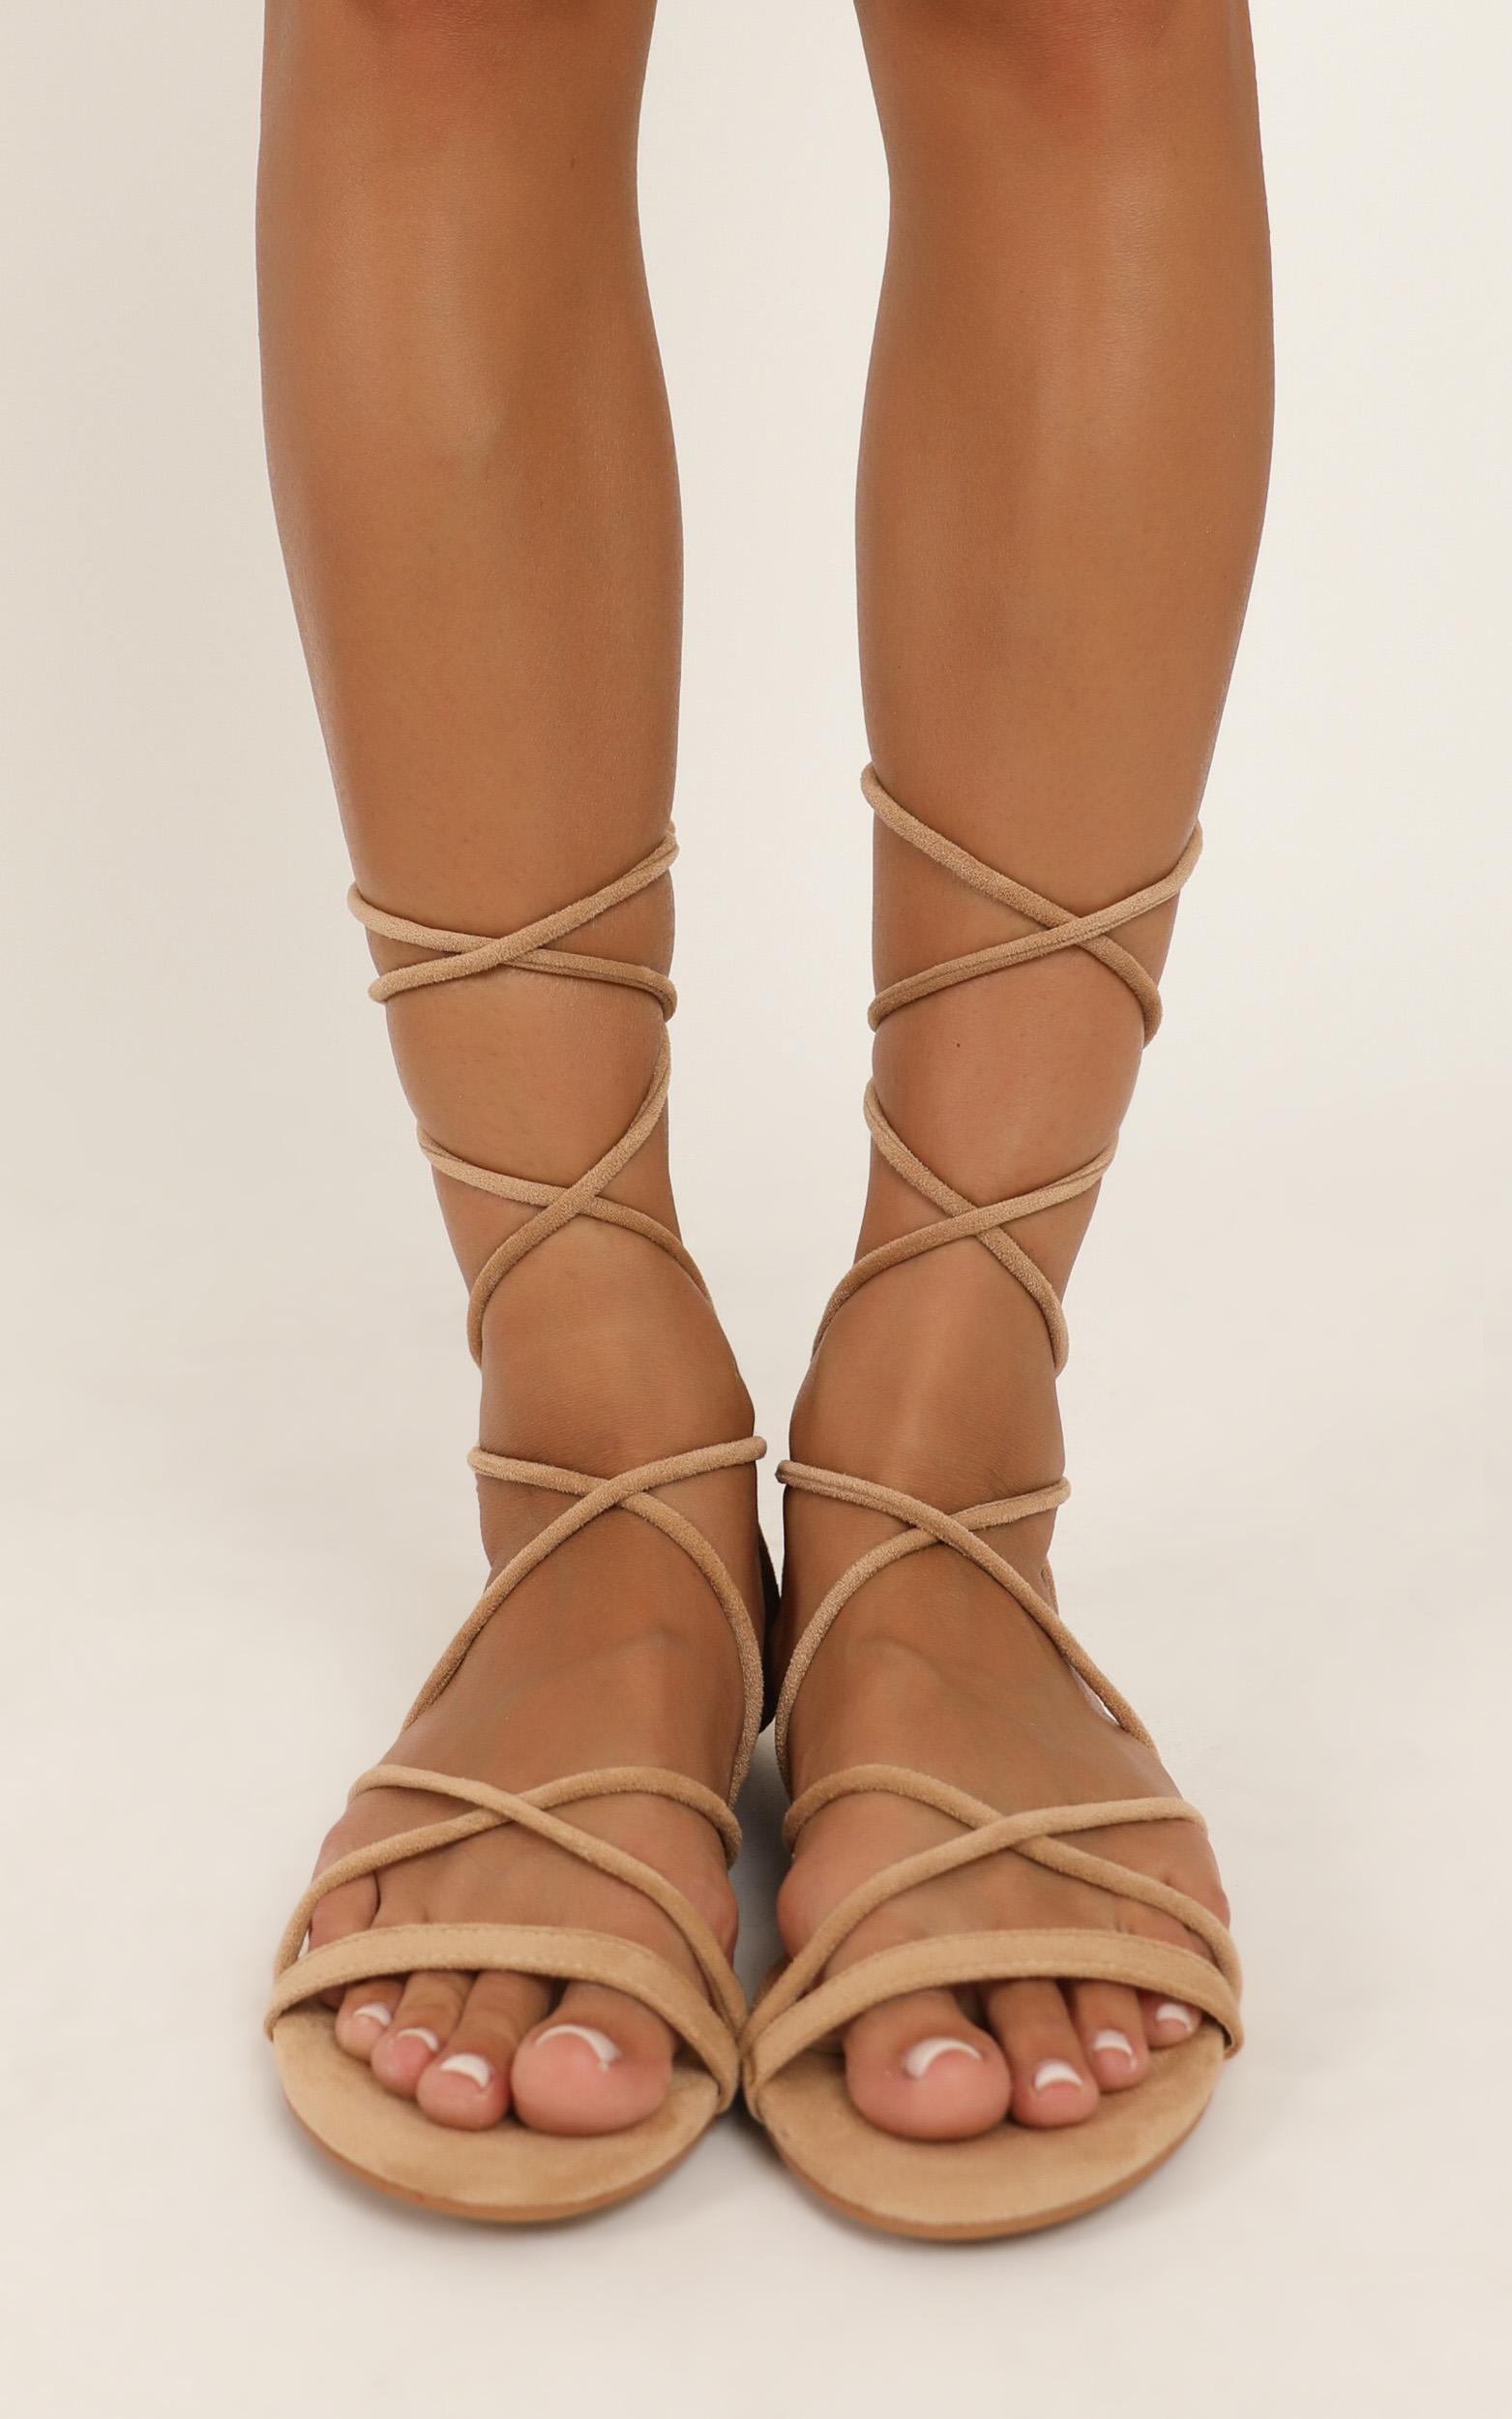 Billini - Dhana Sandals in camel micro - 10, Camel, hi-res image number null